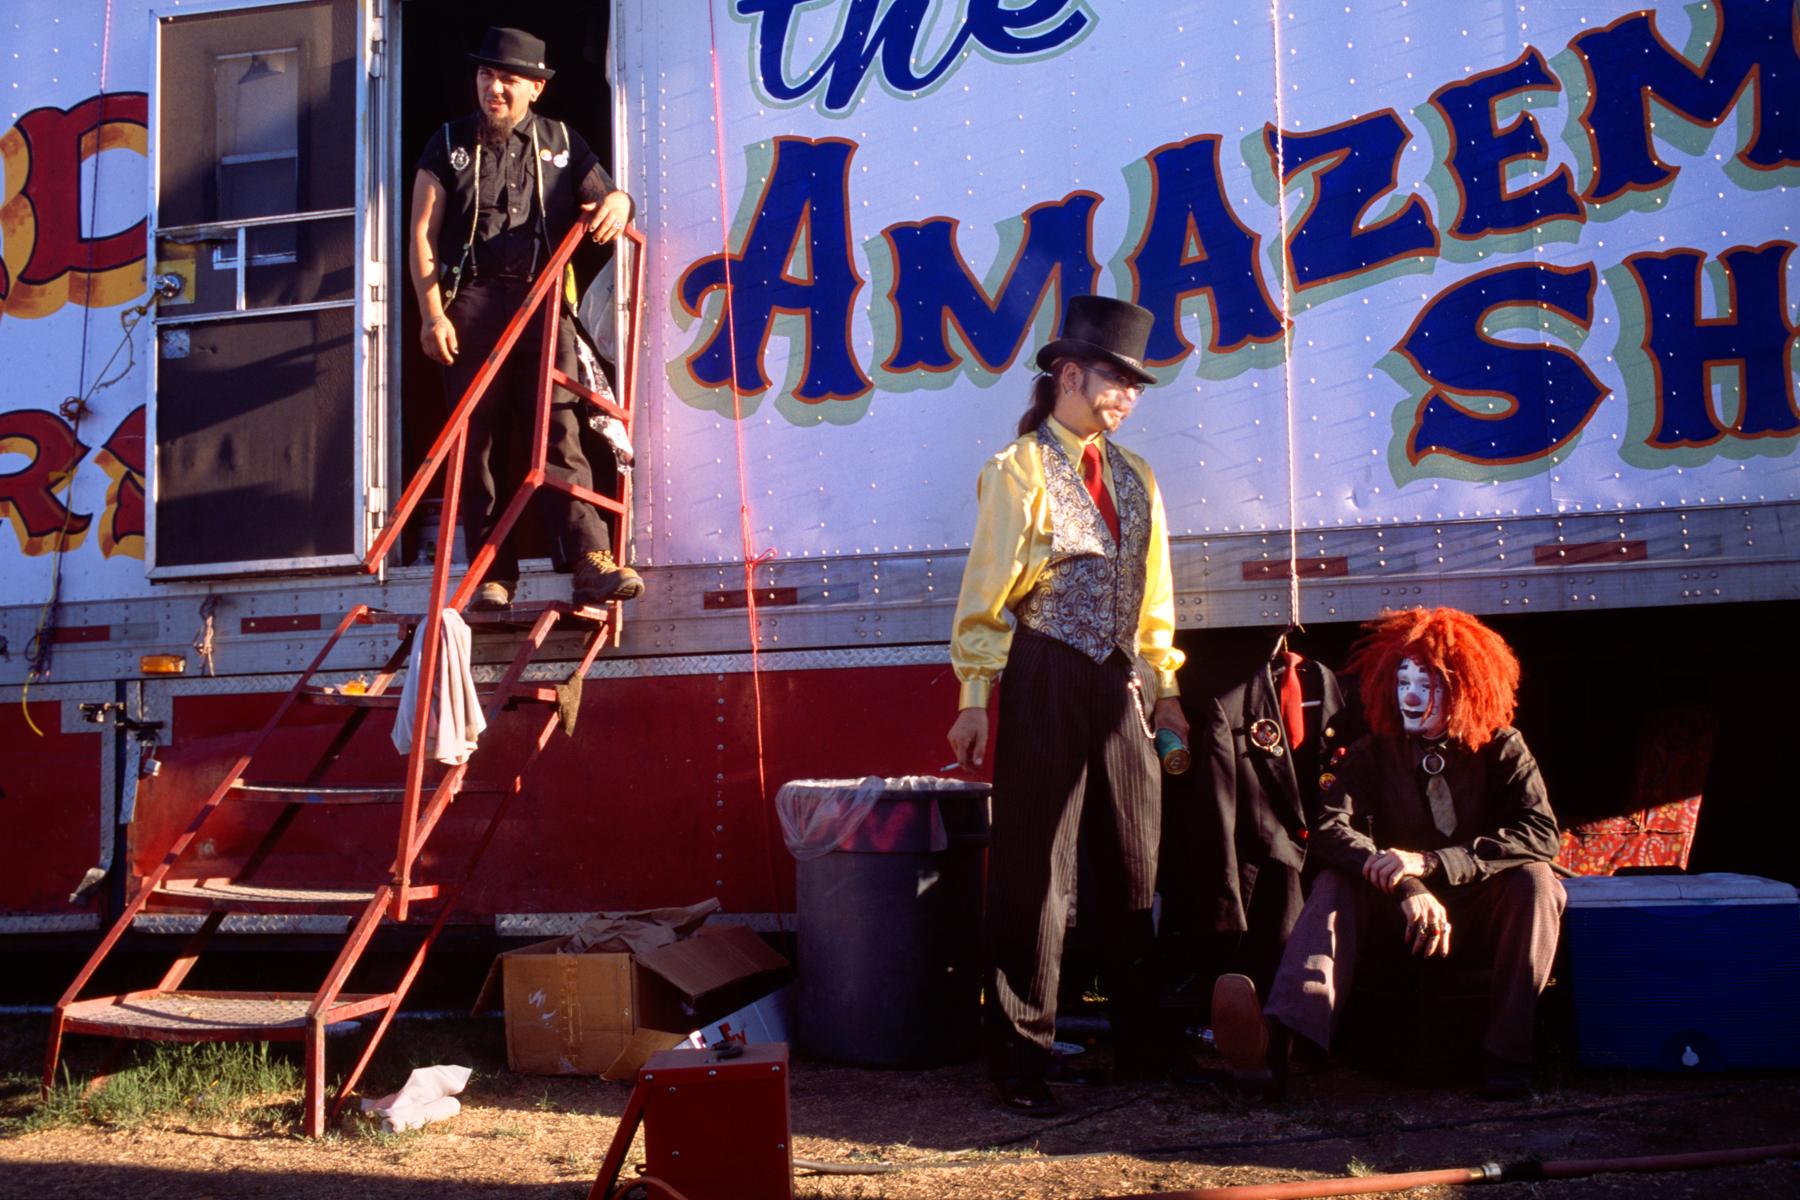 Whodini, Doc Tetanus, and Rash le Clown take a break behind the trailer